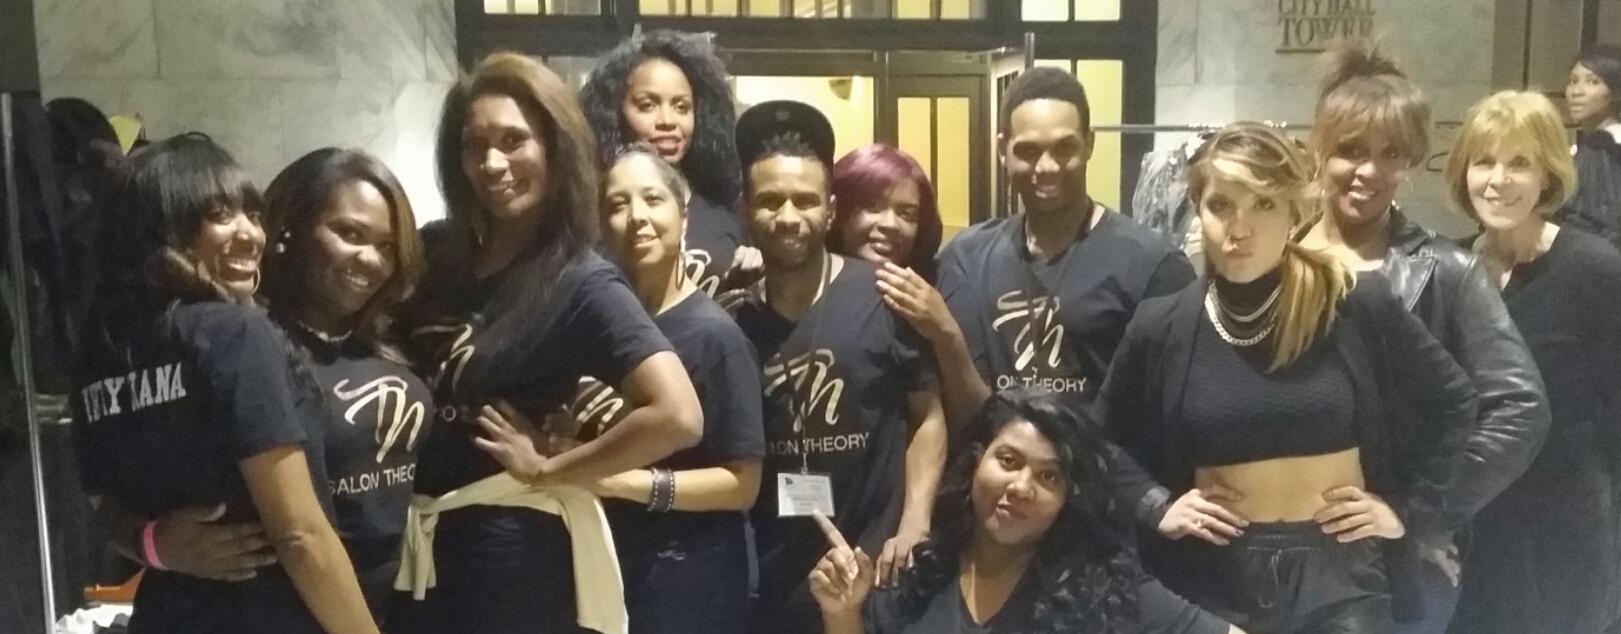 Custom T Shirts For The Best Salon In Atlanta Salon Theory